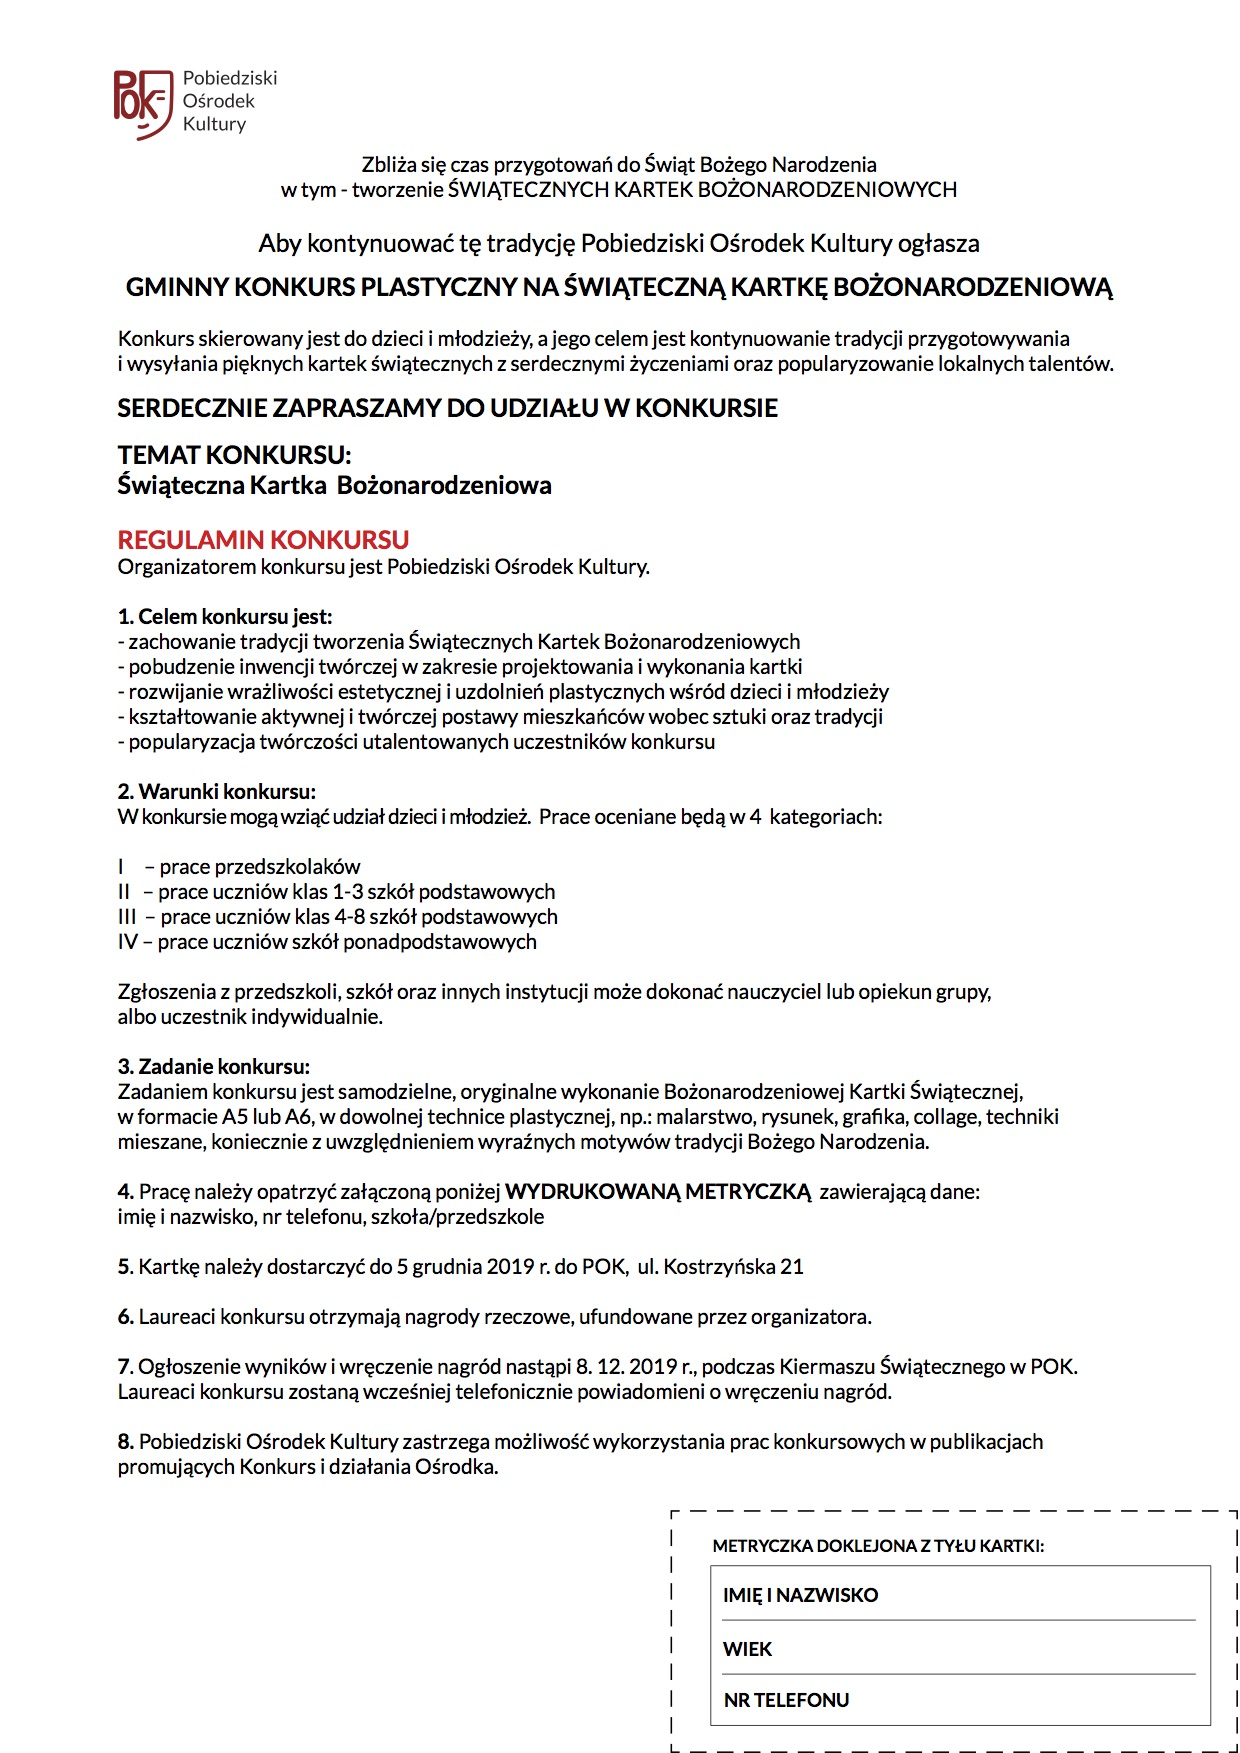 REGULAMIN KONKURSU - KARTKA BOŻONAR 2019